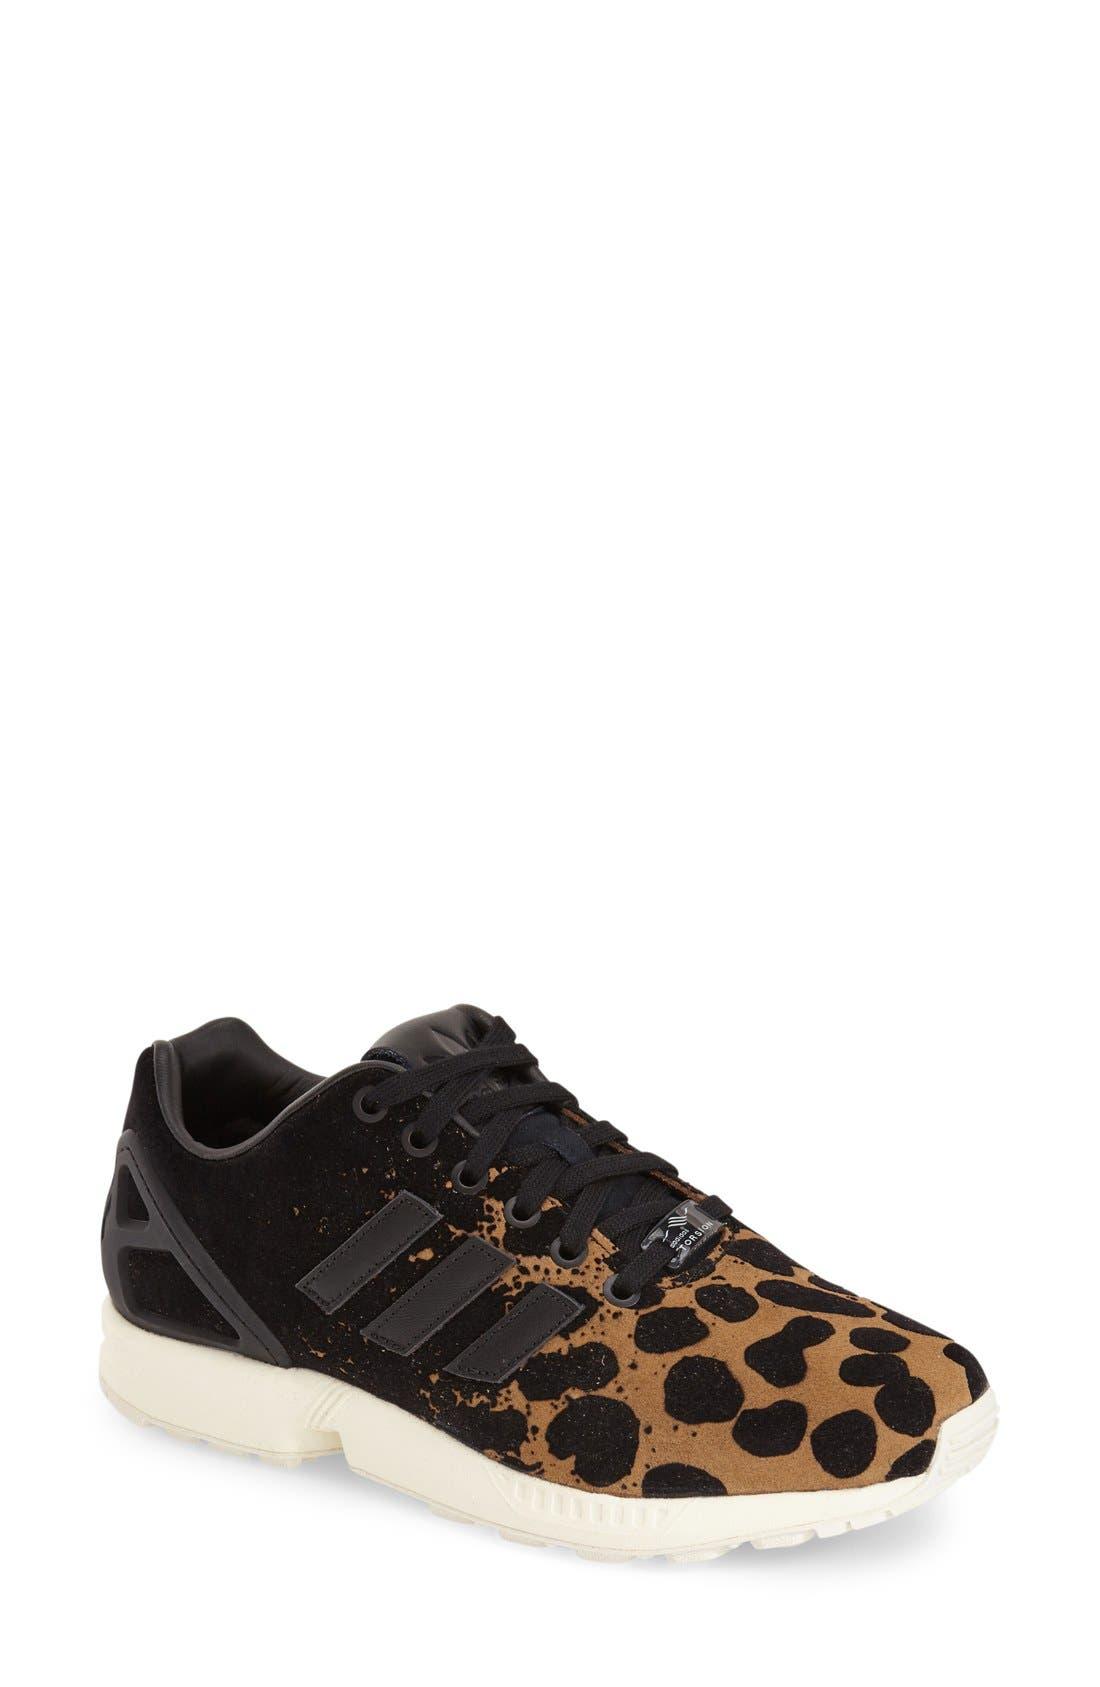 'ZX Flux' Sneaker, Main, color, 001